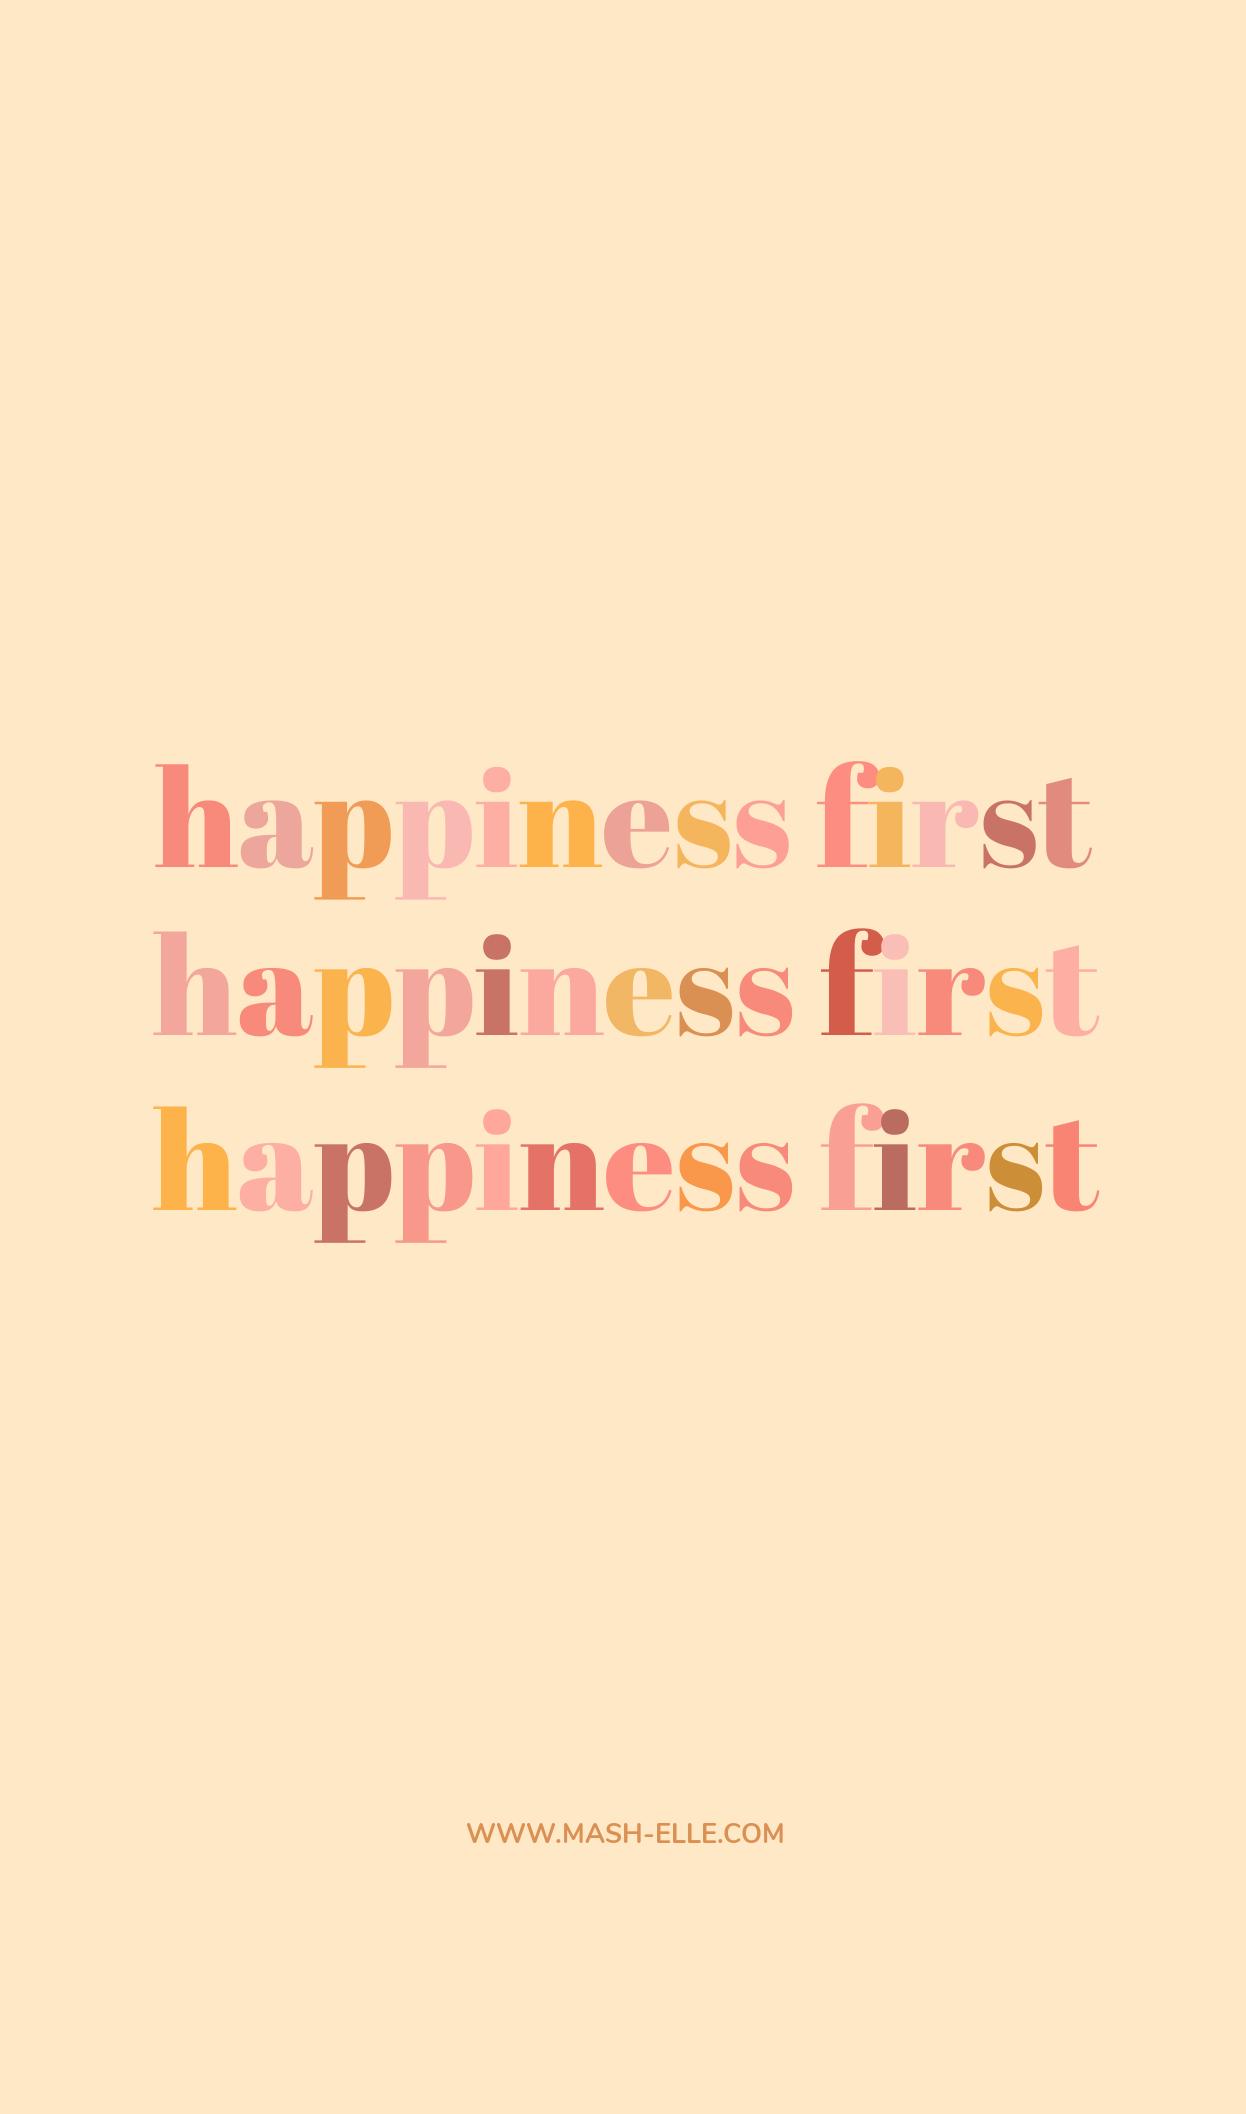 self love wallpaper | lockscreen | iphone background | mash elle | quotes | positivity